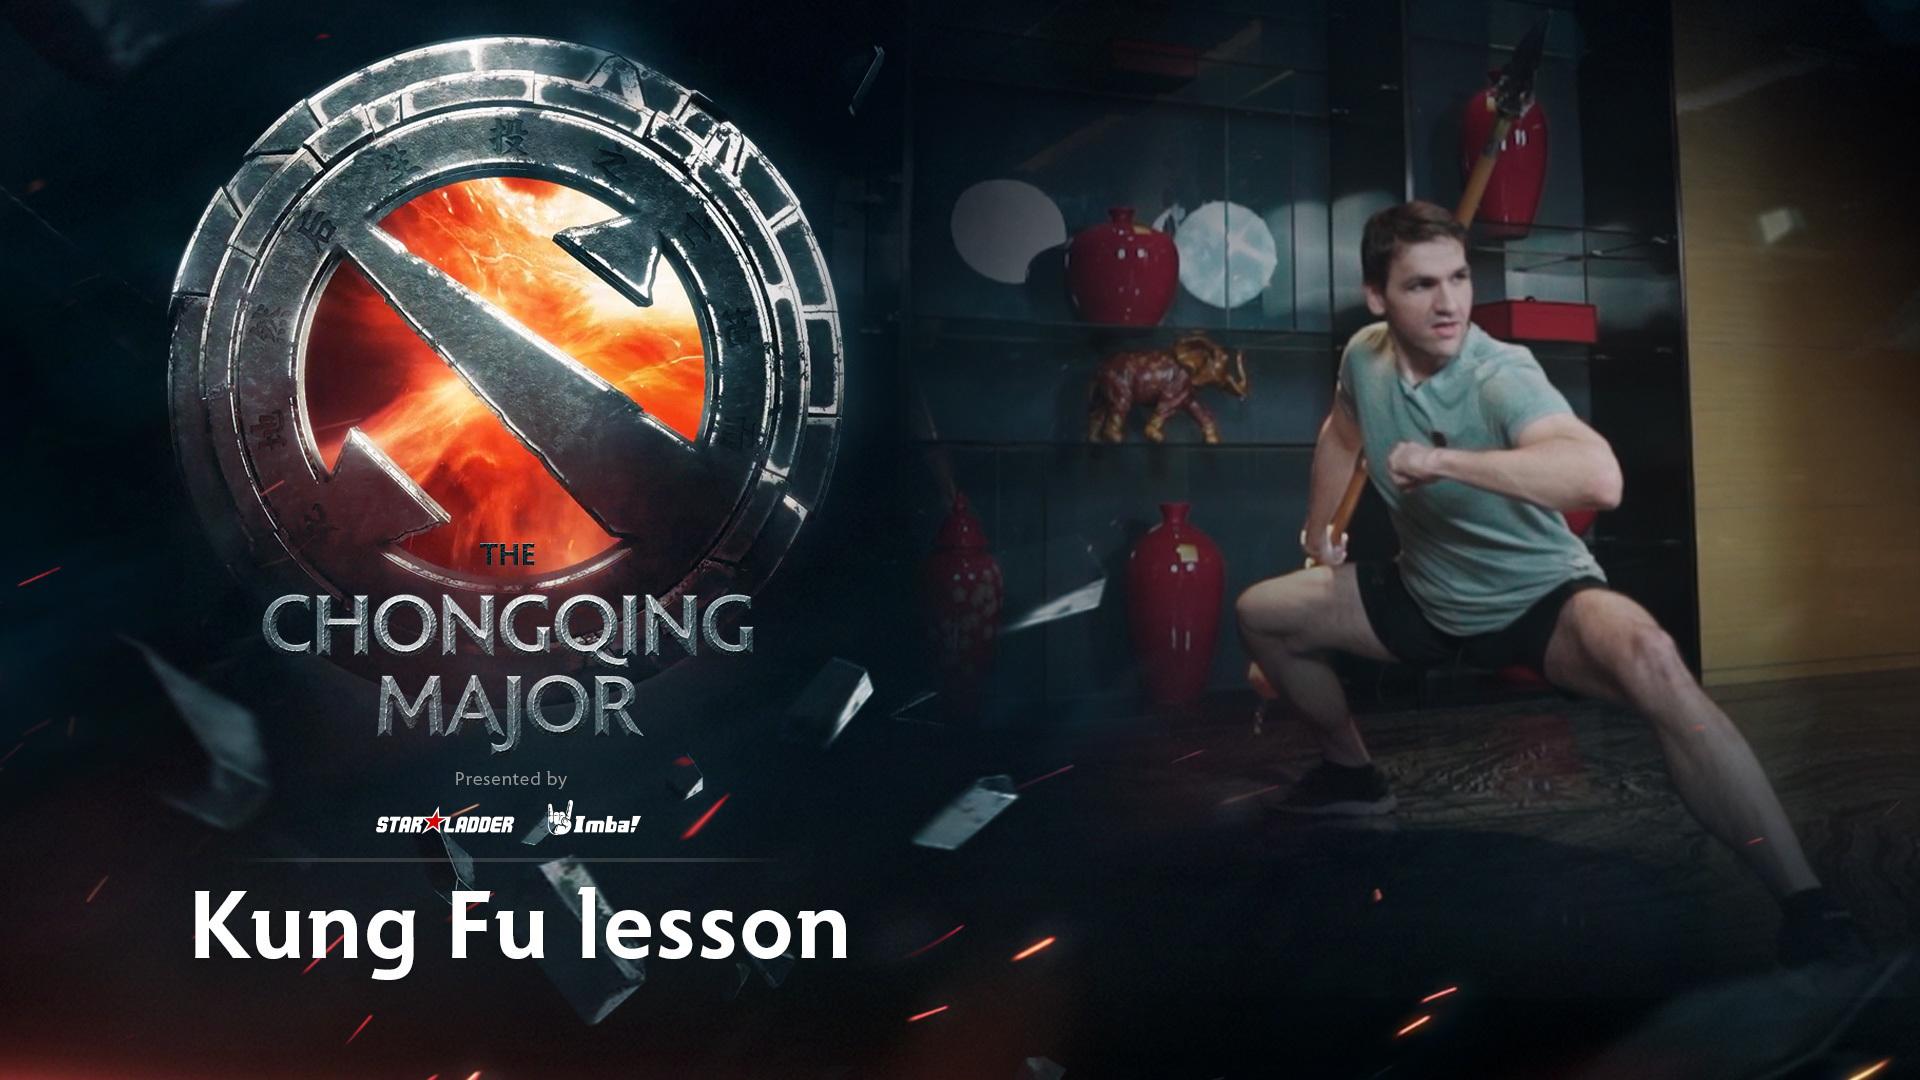 The Chongqing Major: Kung Fu lesson